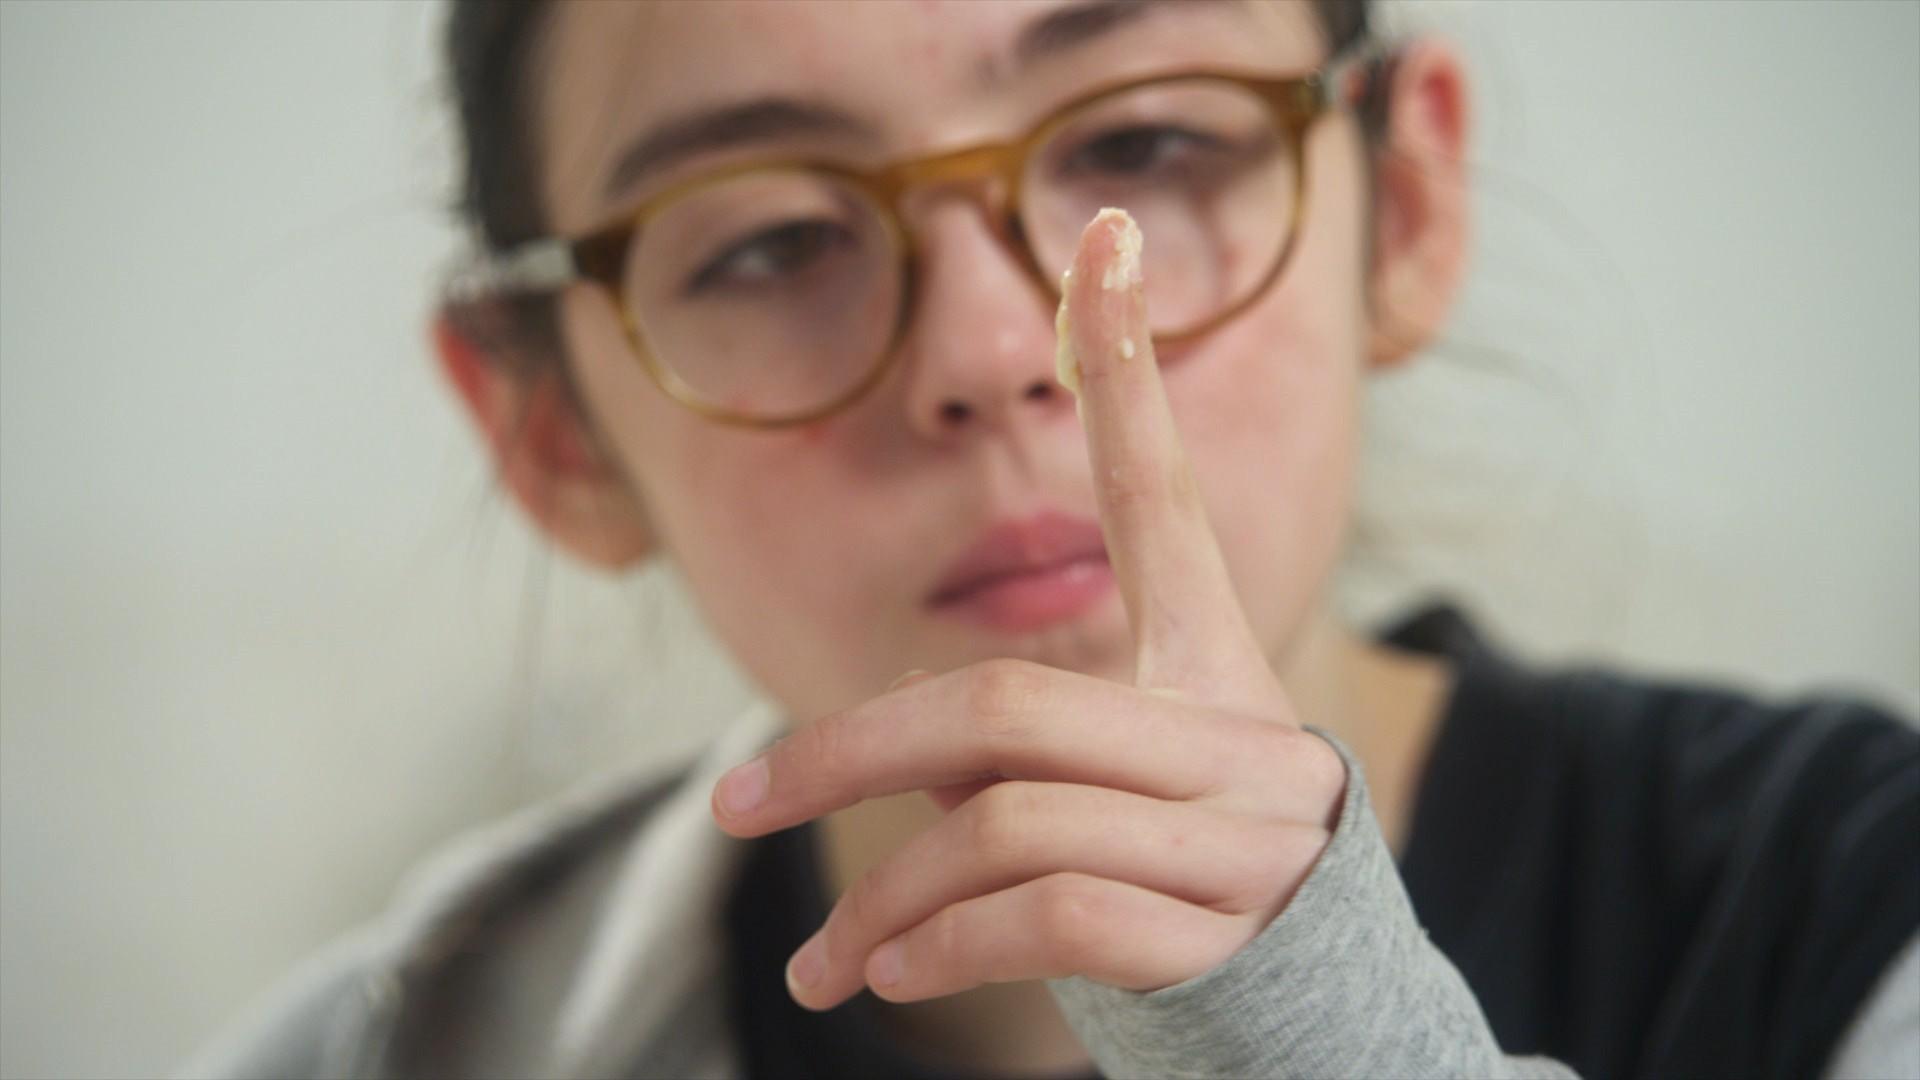 Regardez Junior, le premier film de Julia Ducournau (Titane), dispo sur YouTube